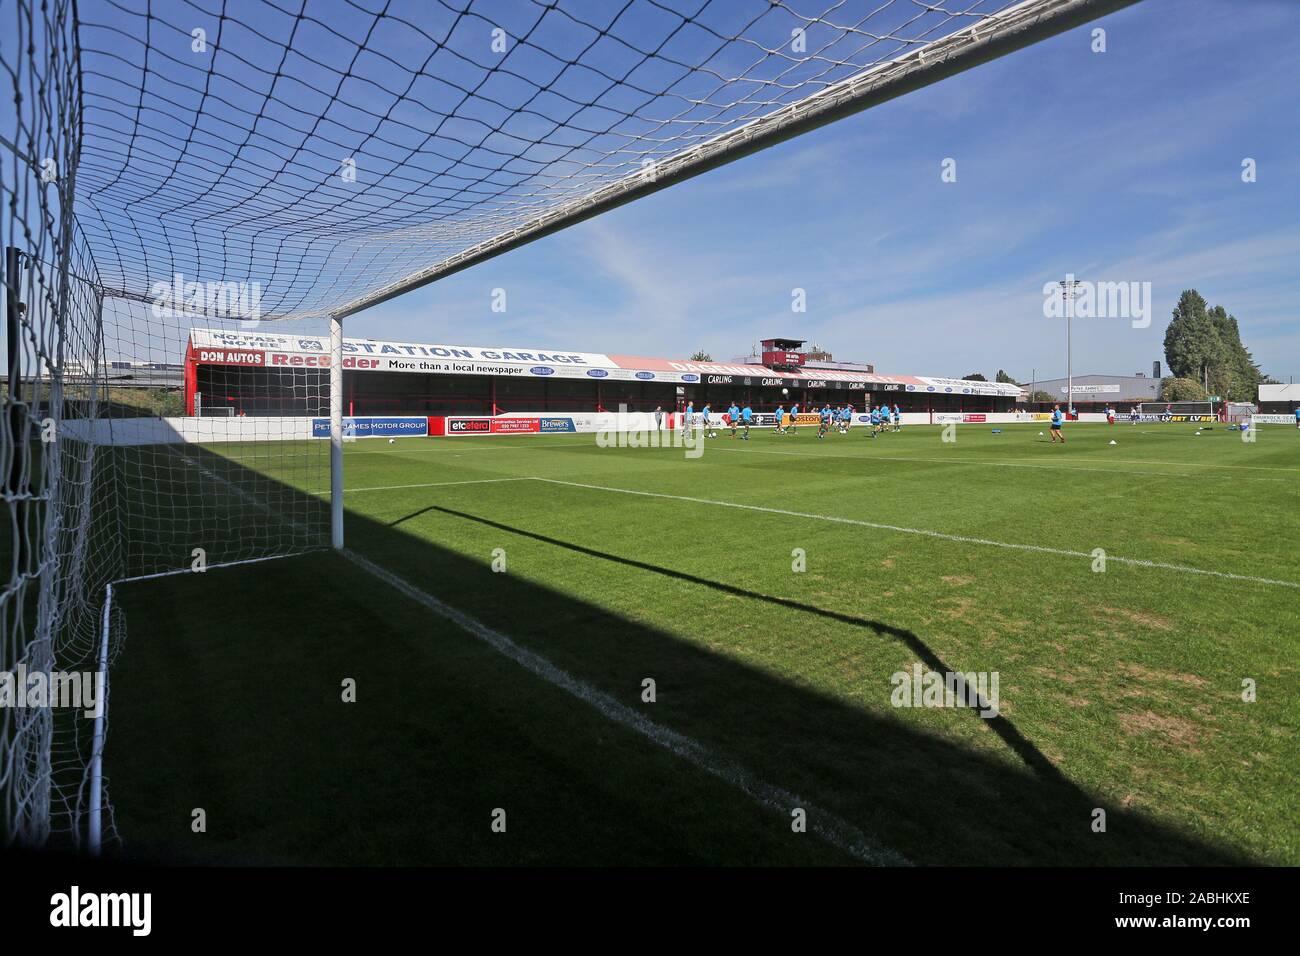 General view of the ground during Dagenham & Redbridge vs Hartlepool United, Vanarama National League Football at the Chigwell Construction Stadium on Stock Photo